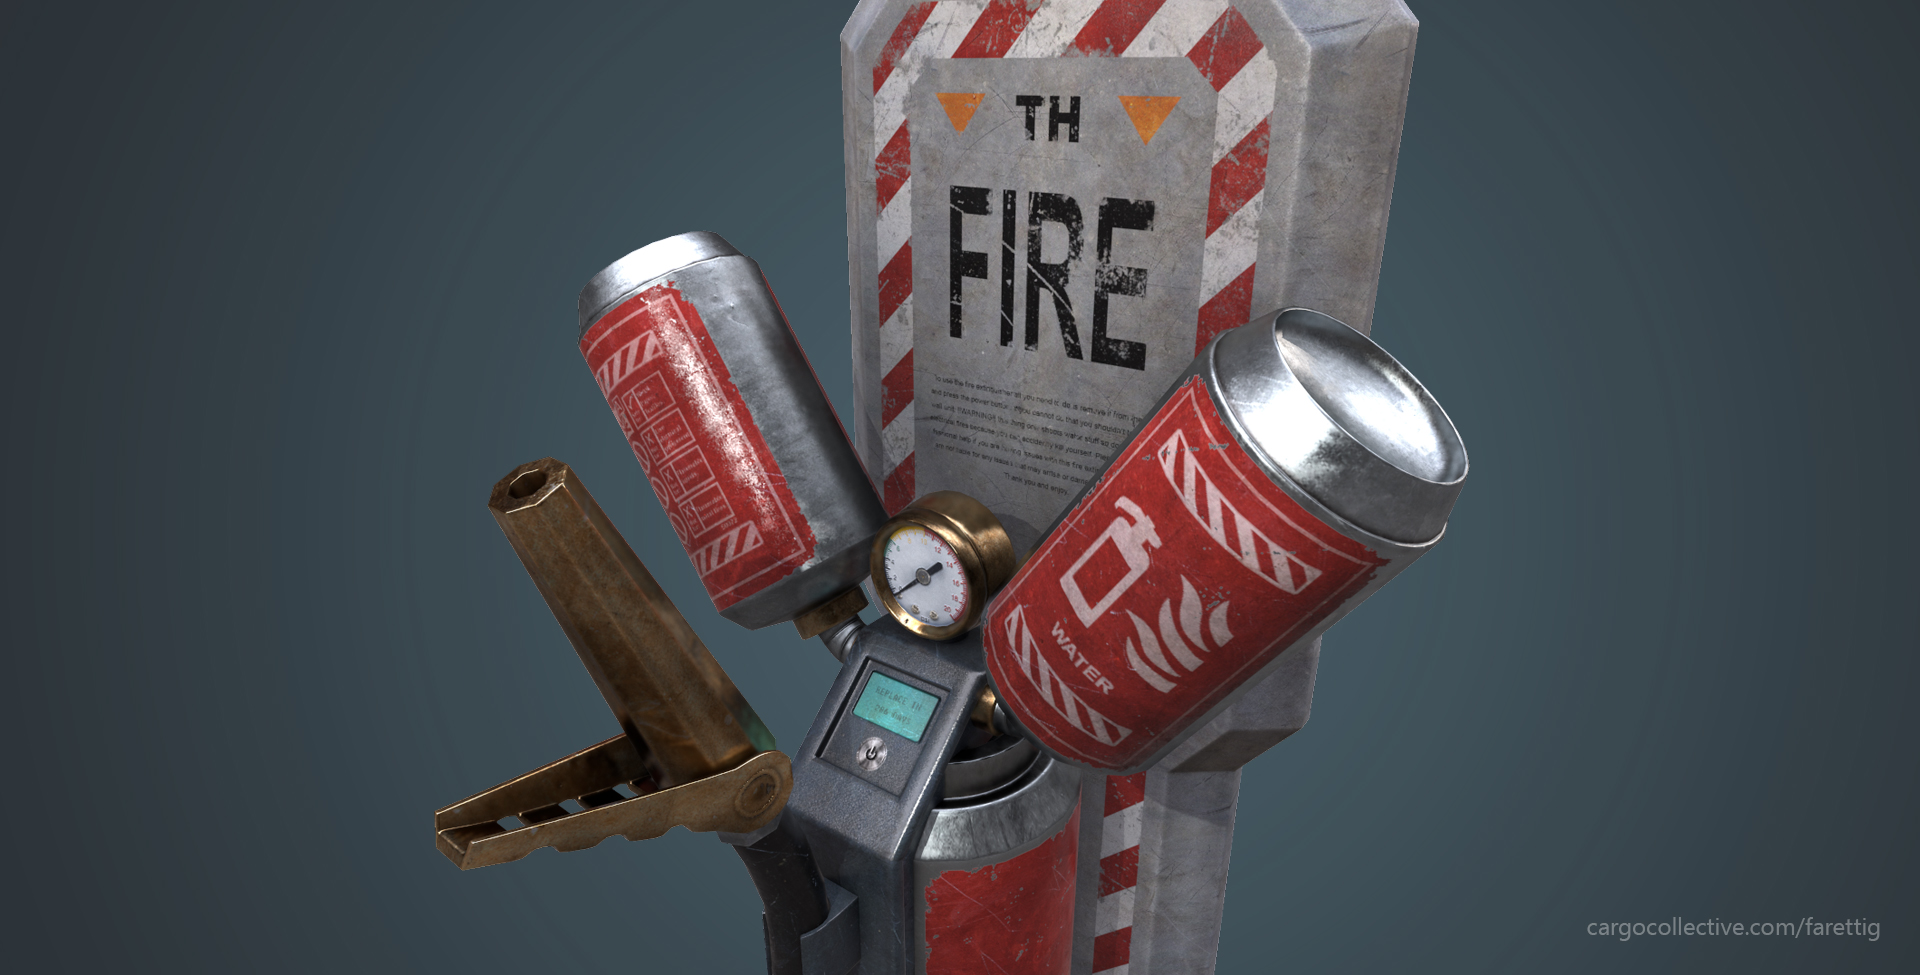 farettig_fire_extinguisher_02_o.jpg